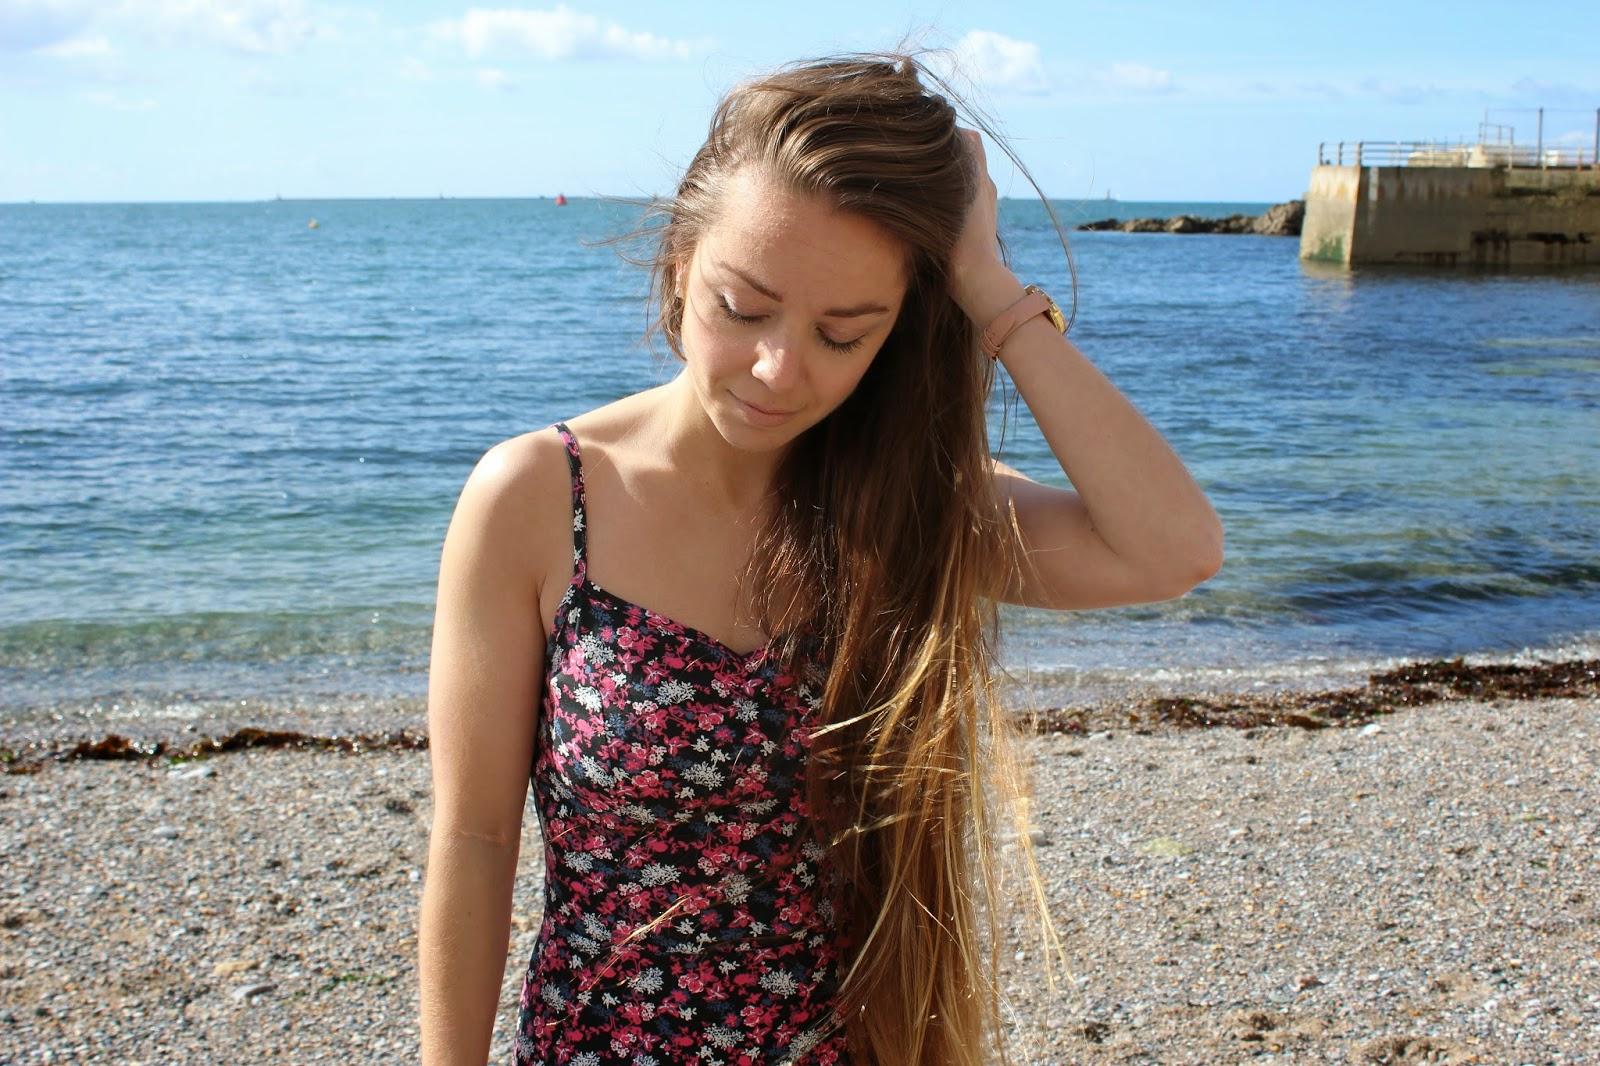 Plymouth fashion blogger